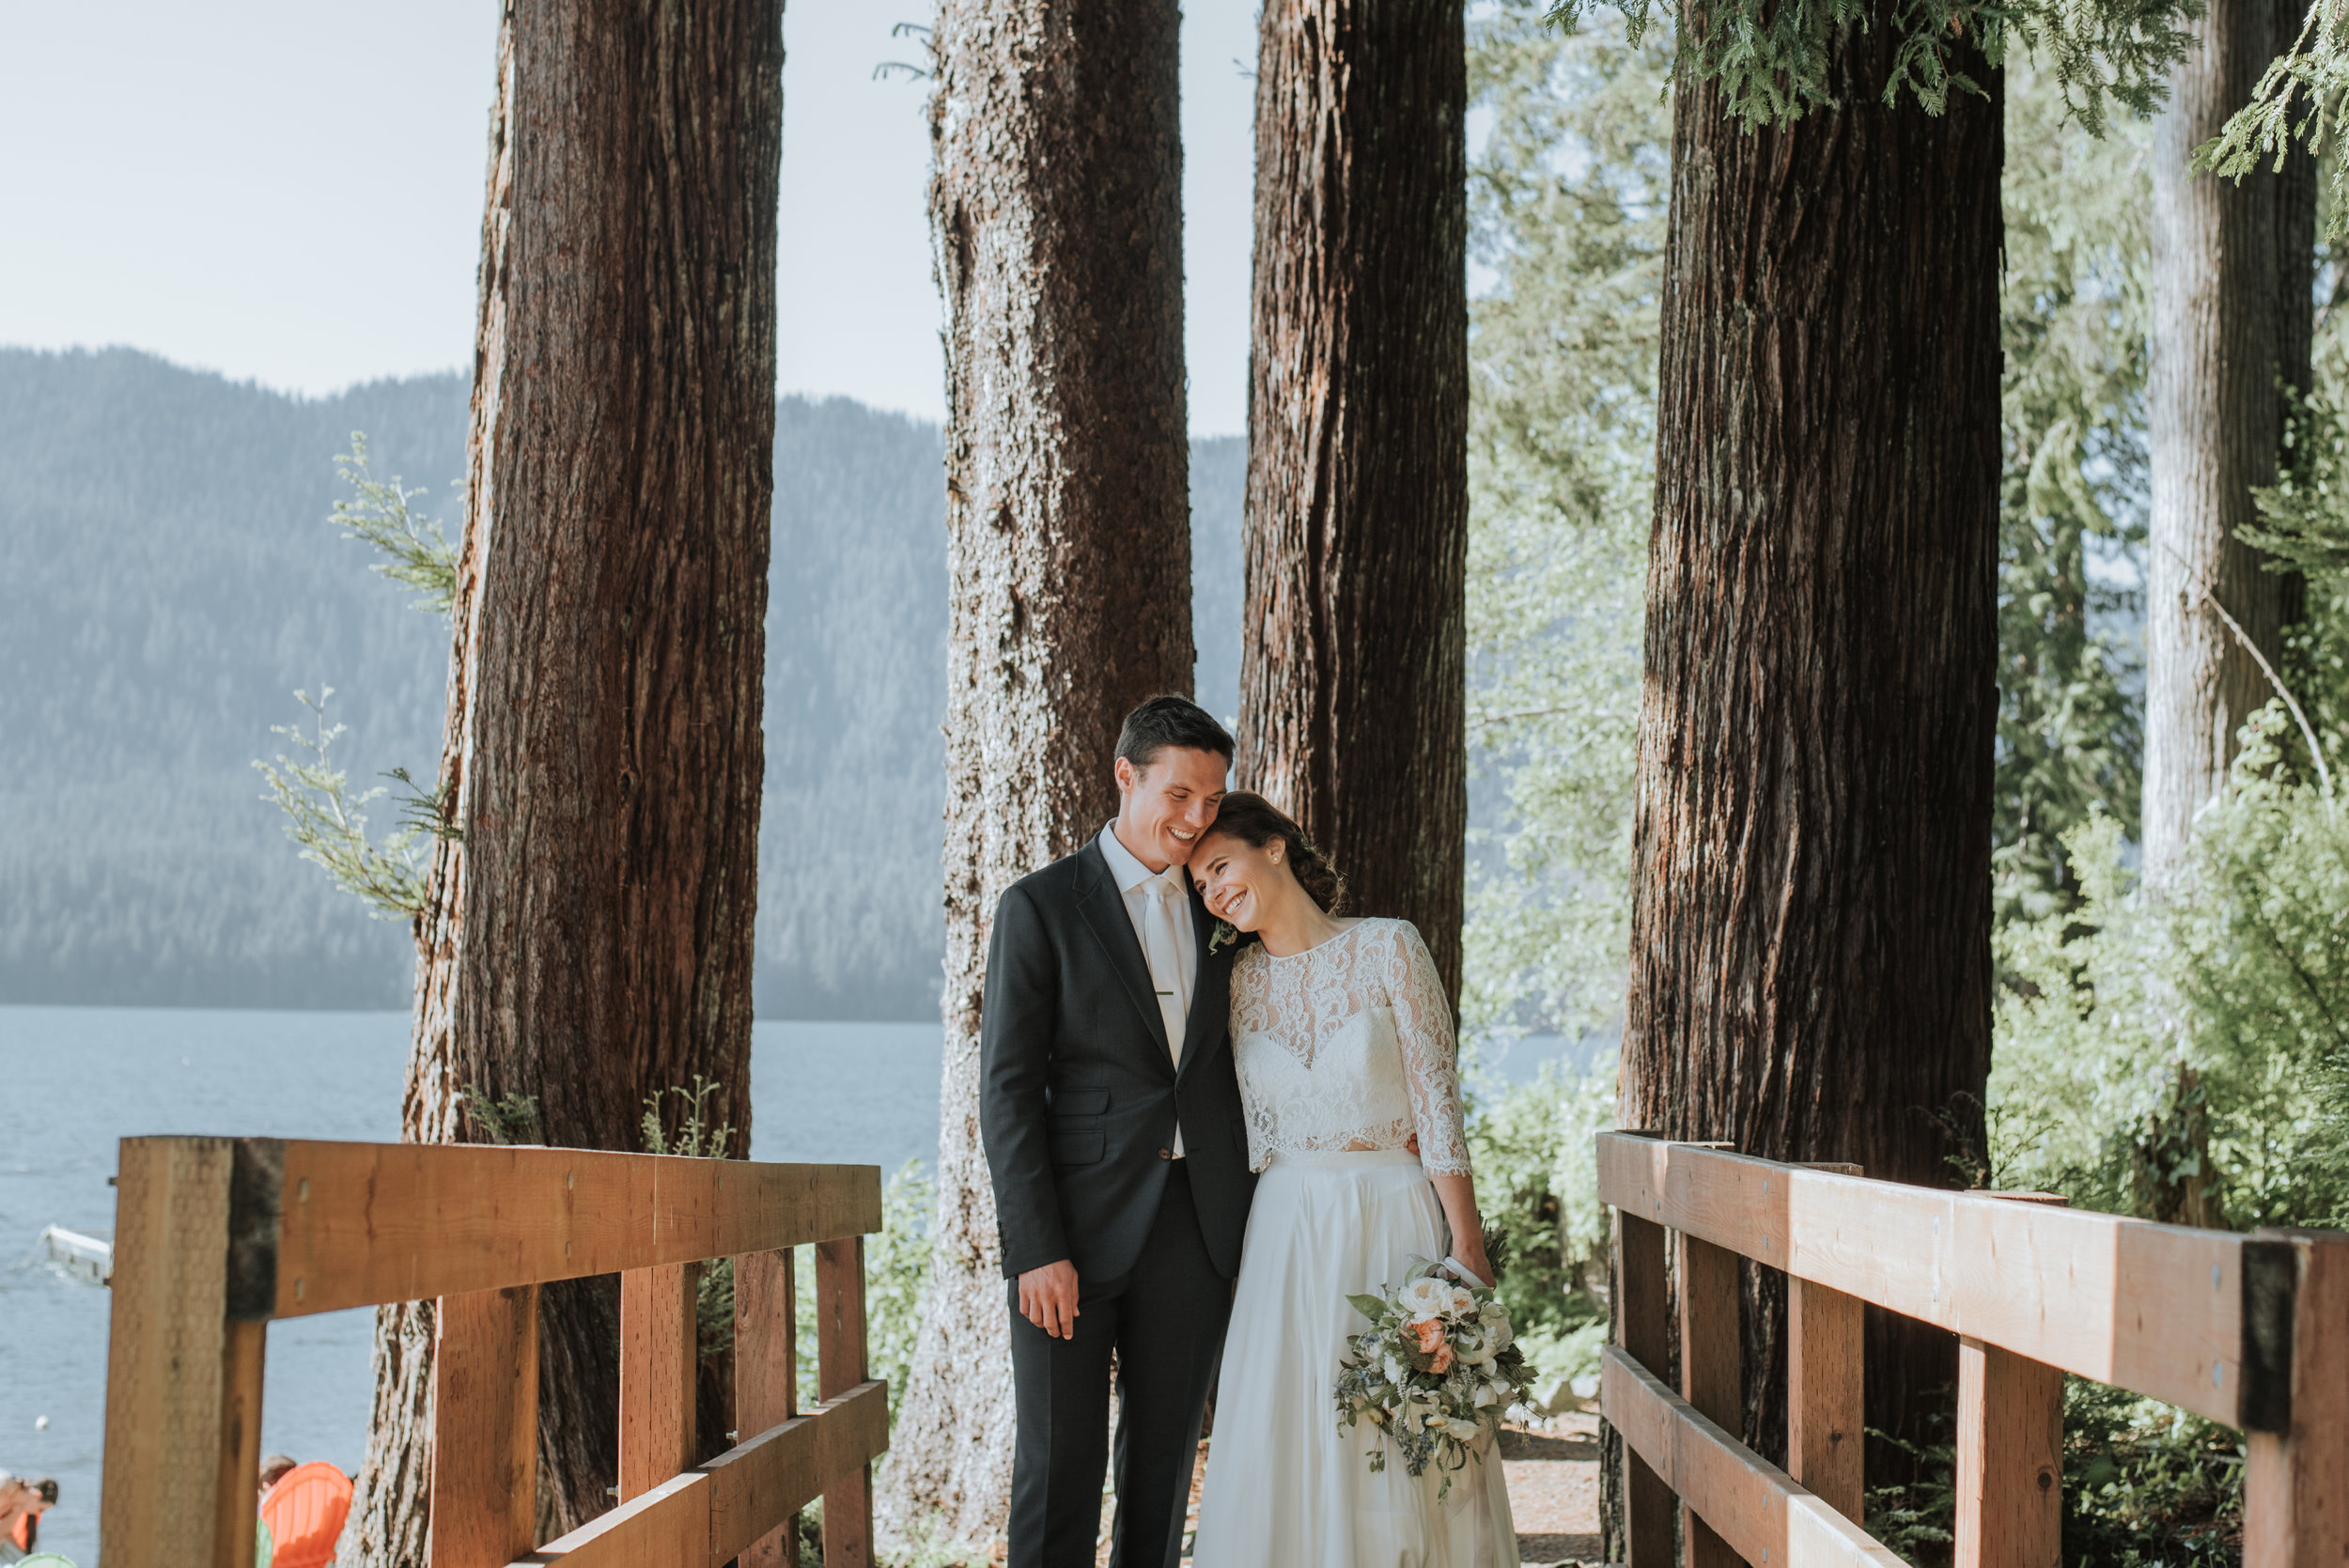 Elizabeth & Conor - Quinault, WAVenue: Lake Quinault LodgePhotographer: Logan Smith PhotographyVibe: Rustic